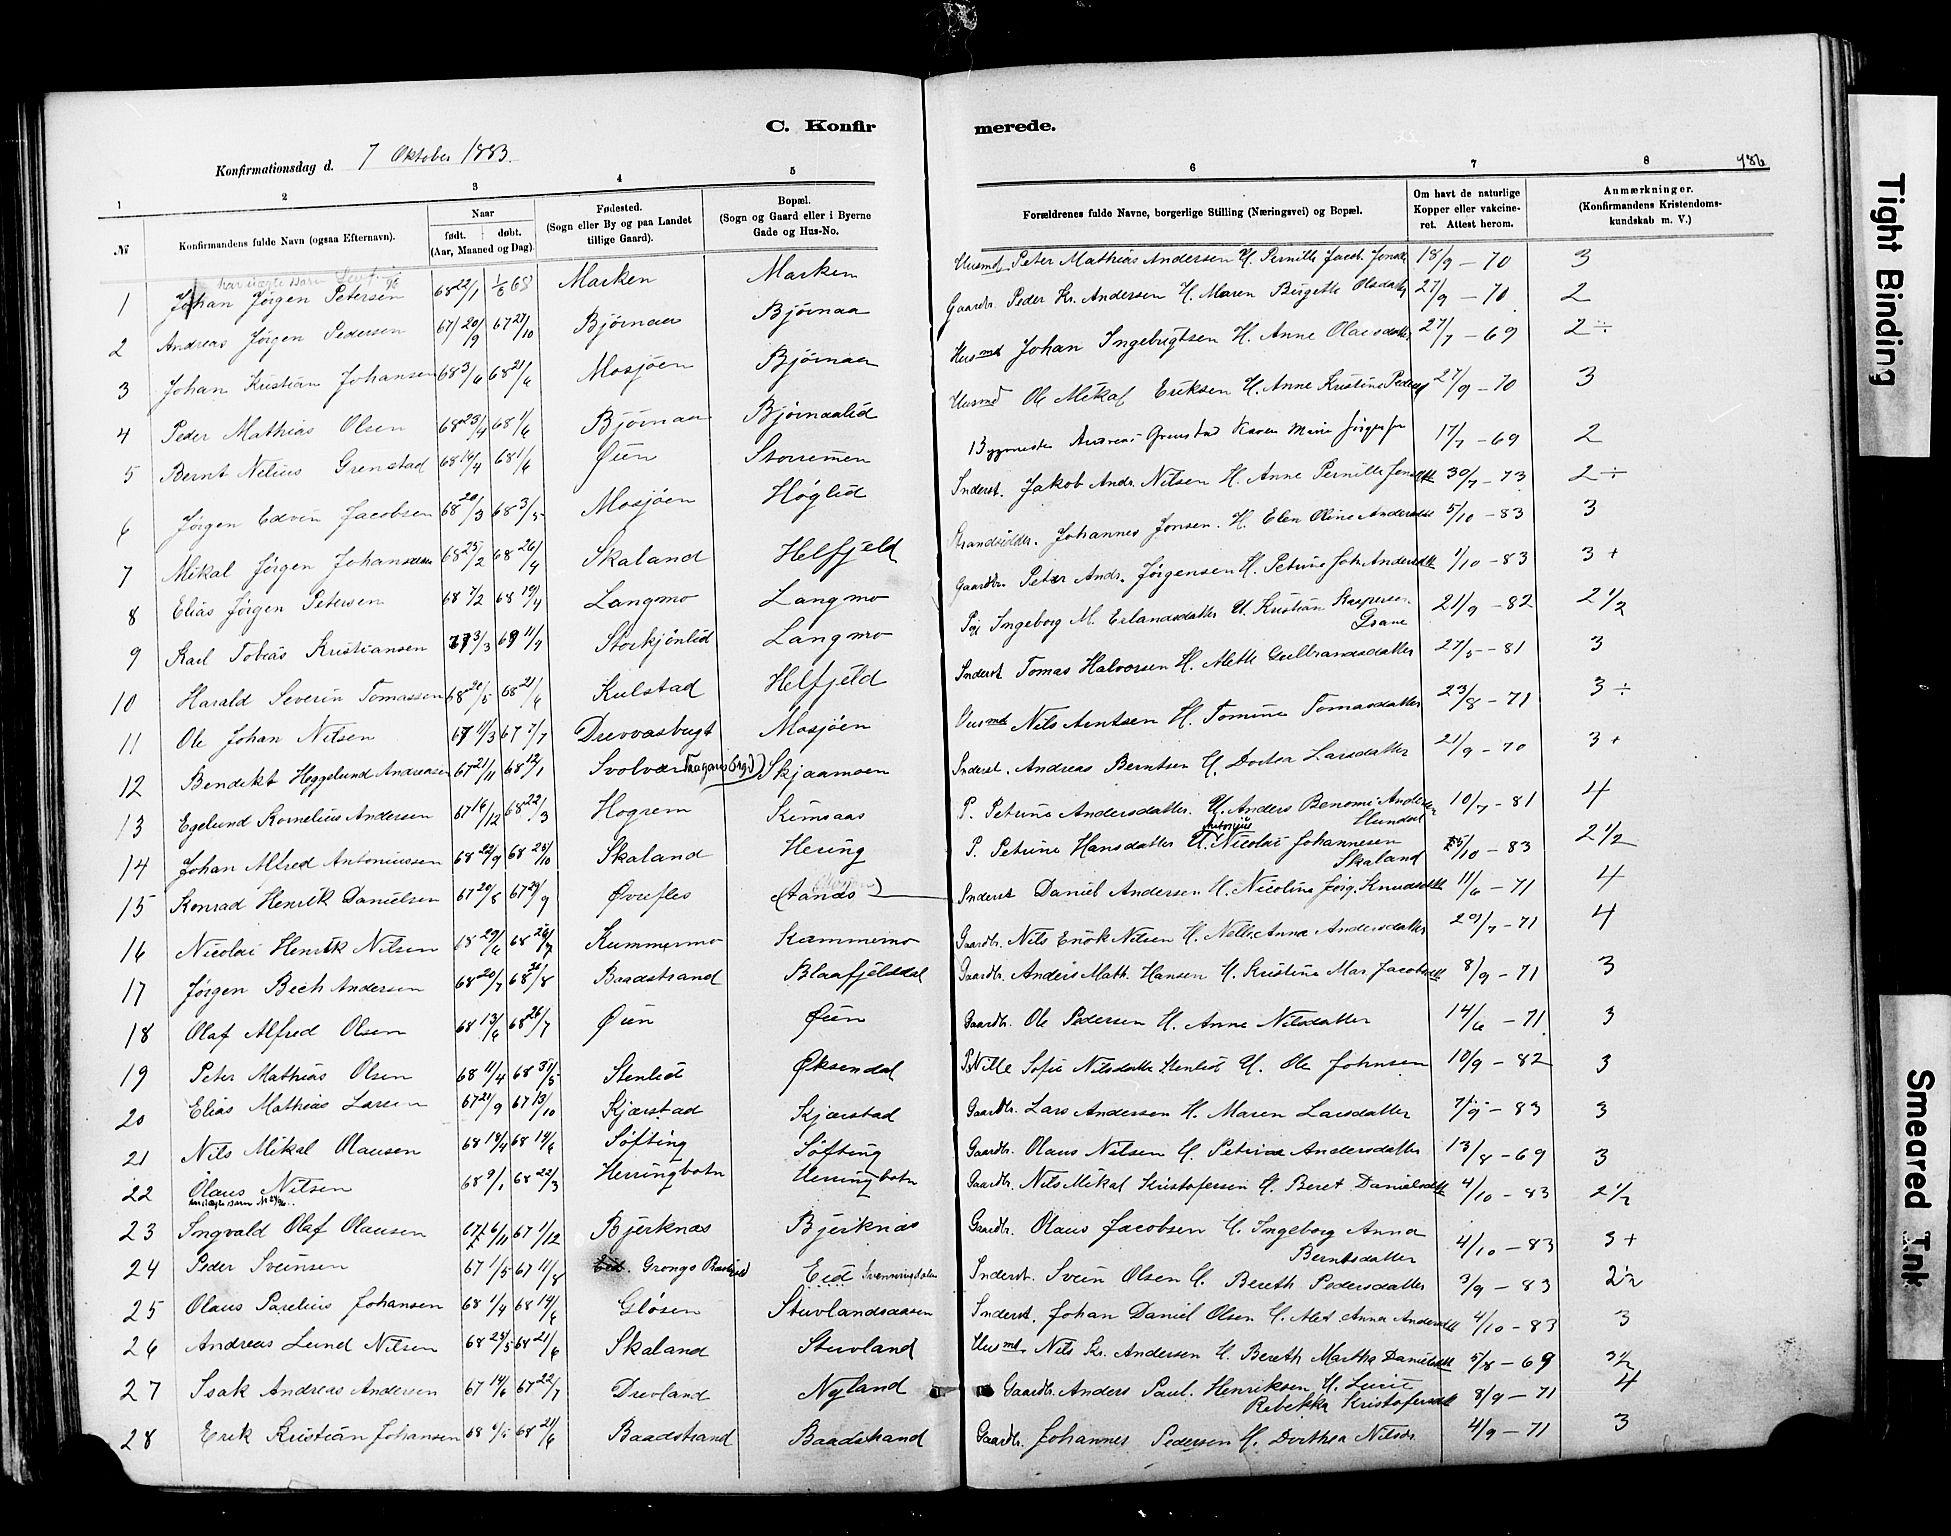 SAT, Ministerialprotokoller, klokkerbøker og fødselsregistre - Nordland, 820/L0295: Ministerialbok nr. 820A16, 1880-1896, s. 186